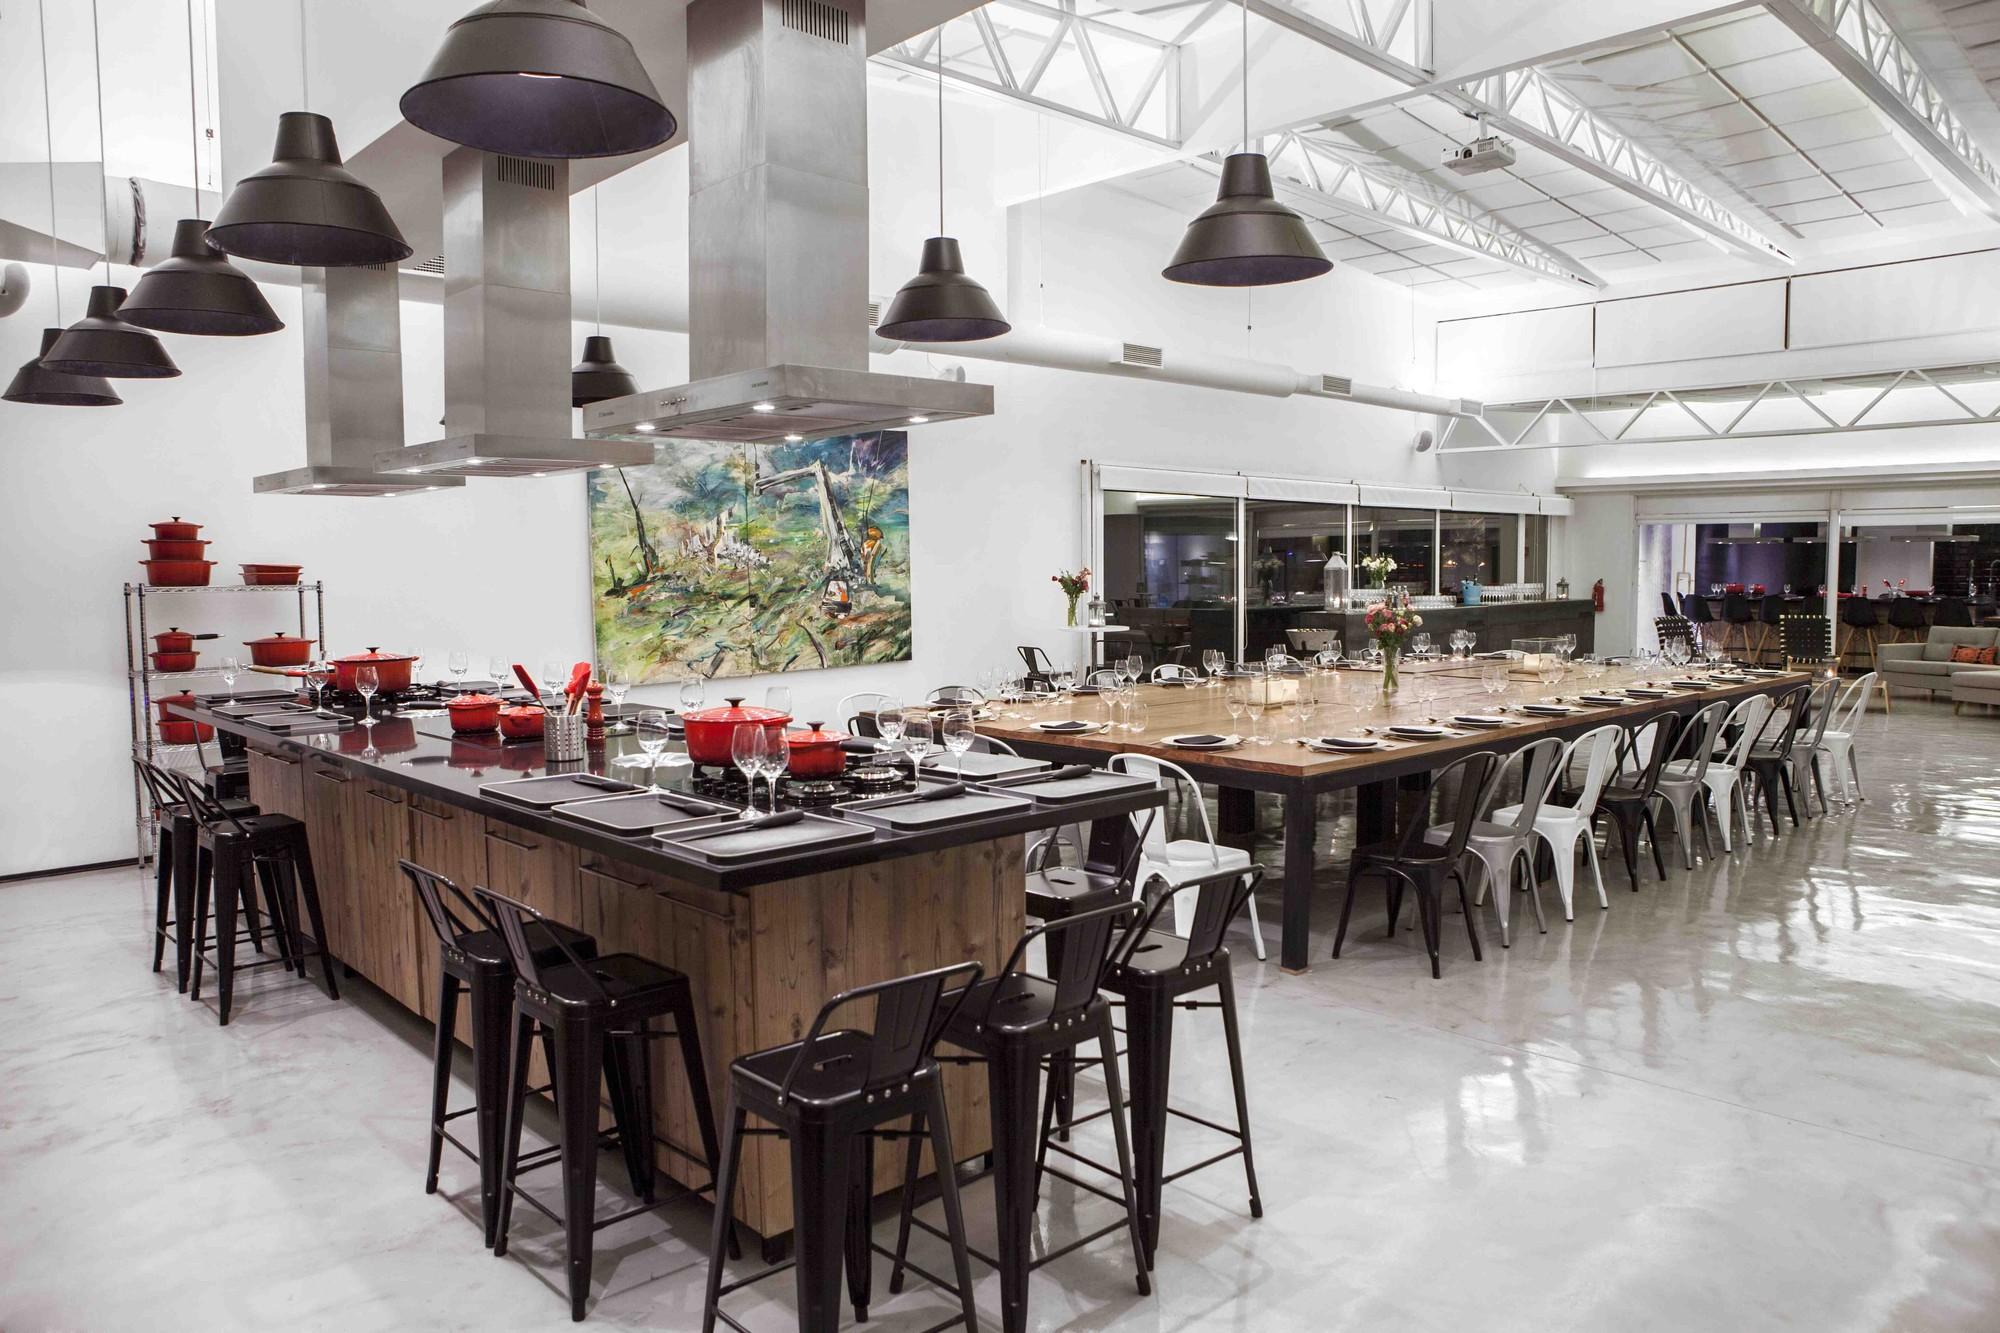 Kitchen Club - Electrolux Chile / Carlos Pascal + Apio Arquitectos, © Alfredo León Bulling